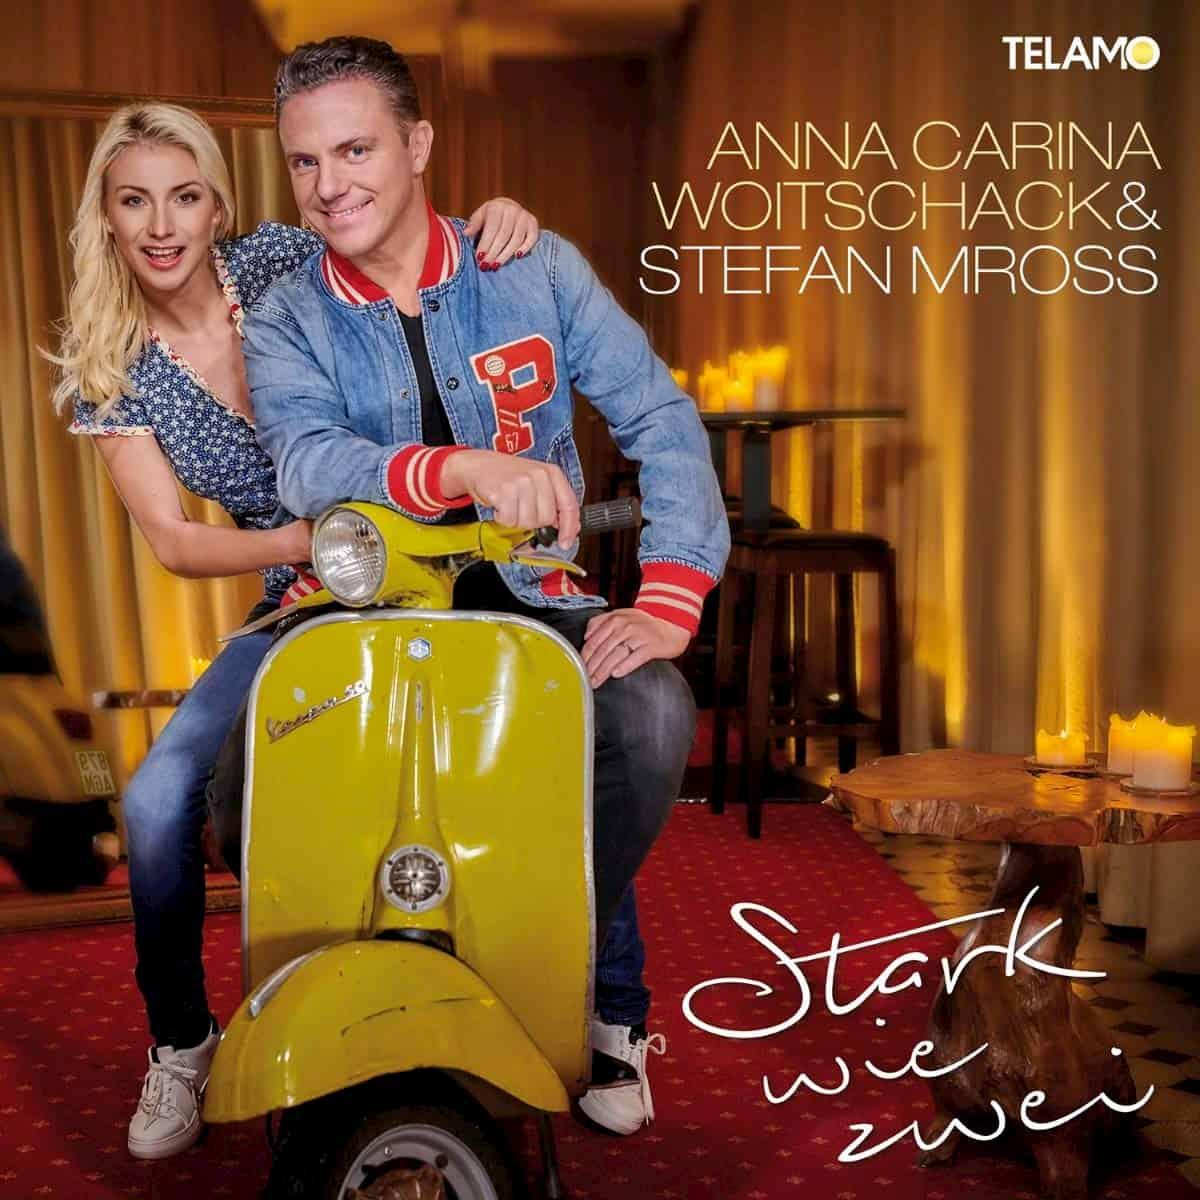 Stefan Mross und Anna-Carina Woitschak neue CD 2020 - Stark wie Zwei